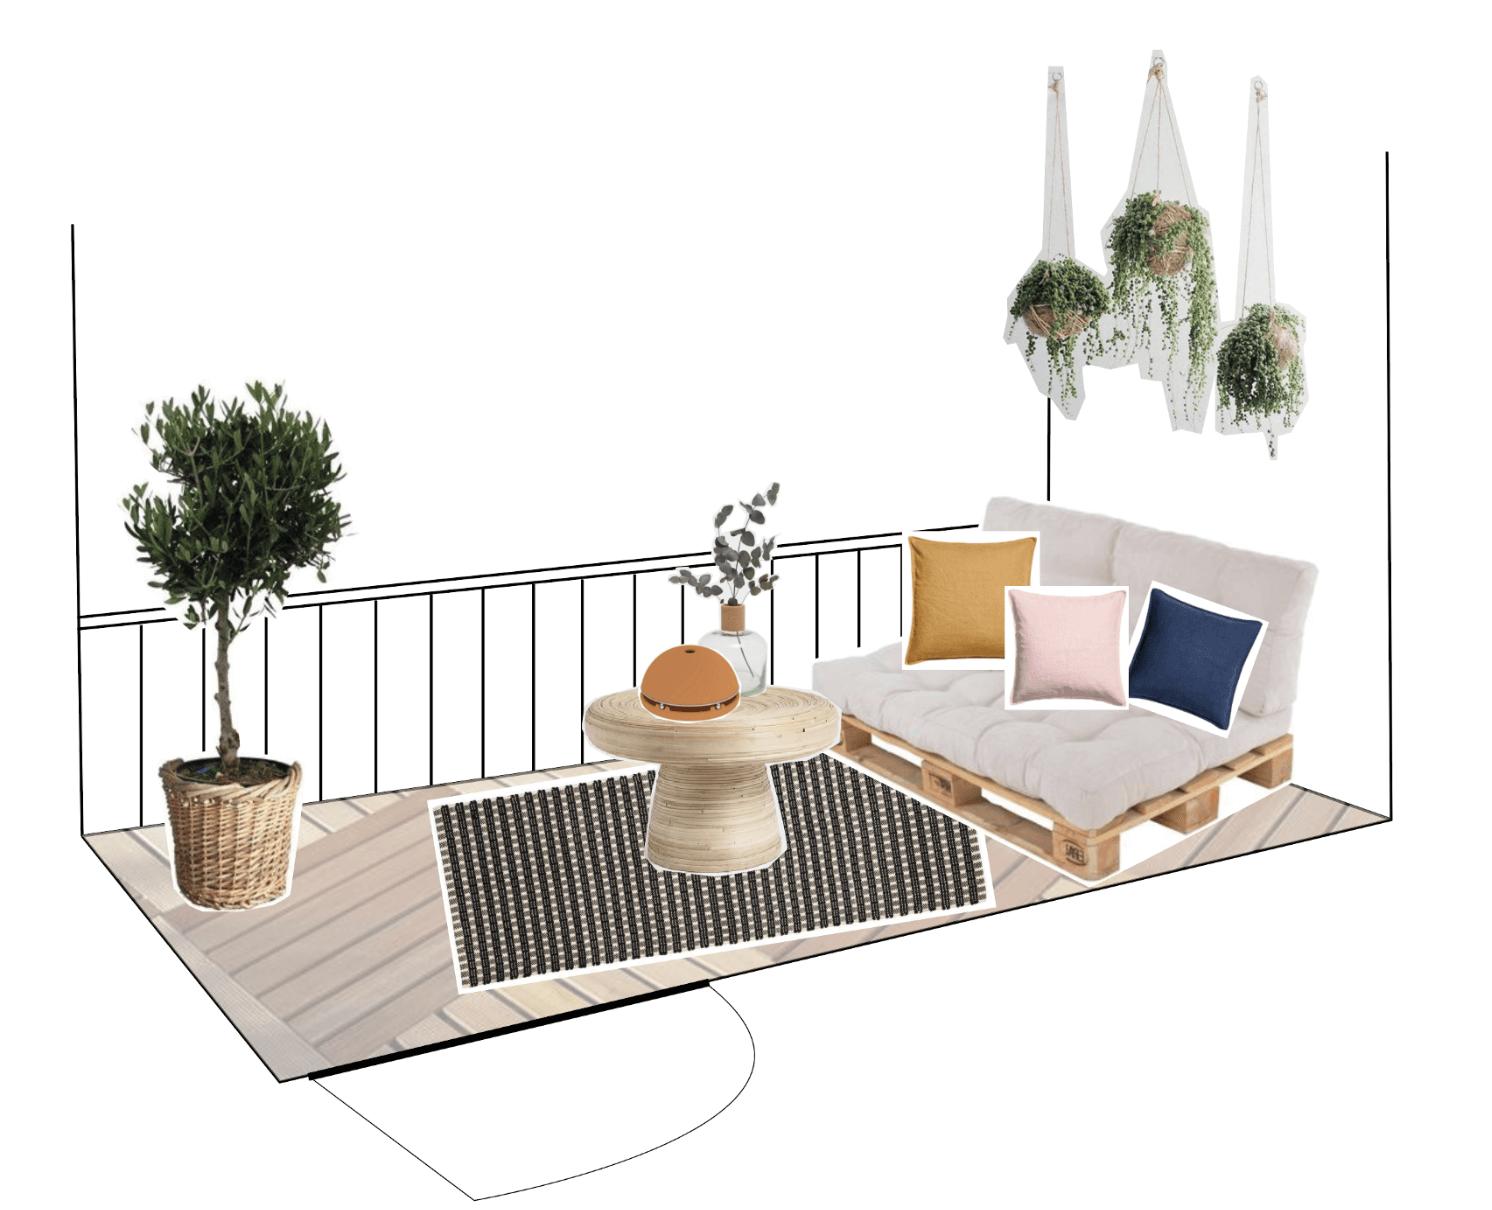 bumper-blog-news-immobilier-lyon-appartement-vente-achat-investir-homestaging-design-decoration-lifestyle-art-14.png